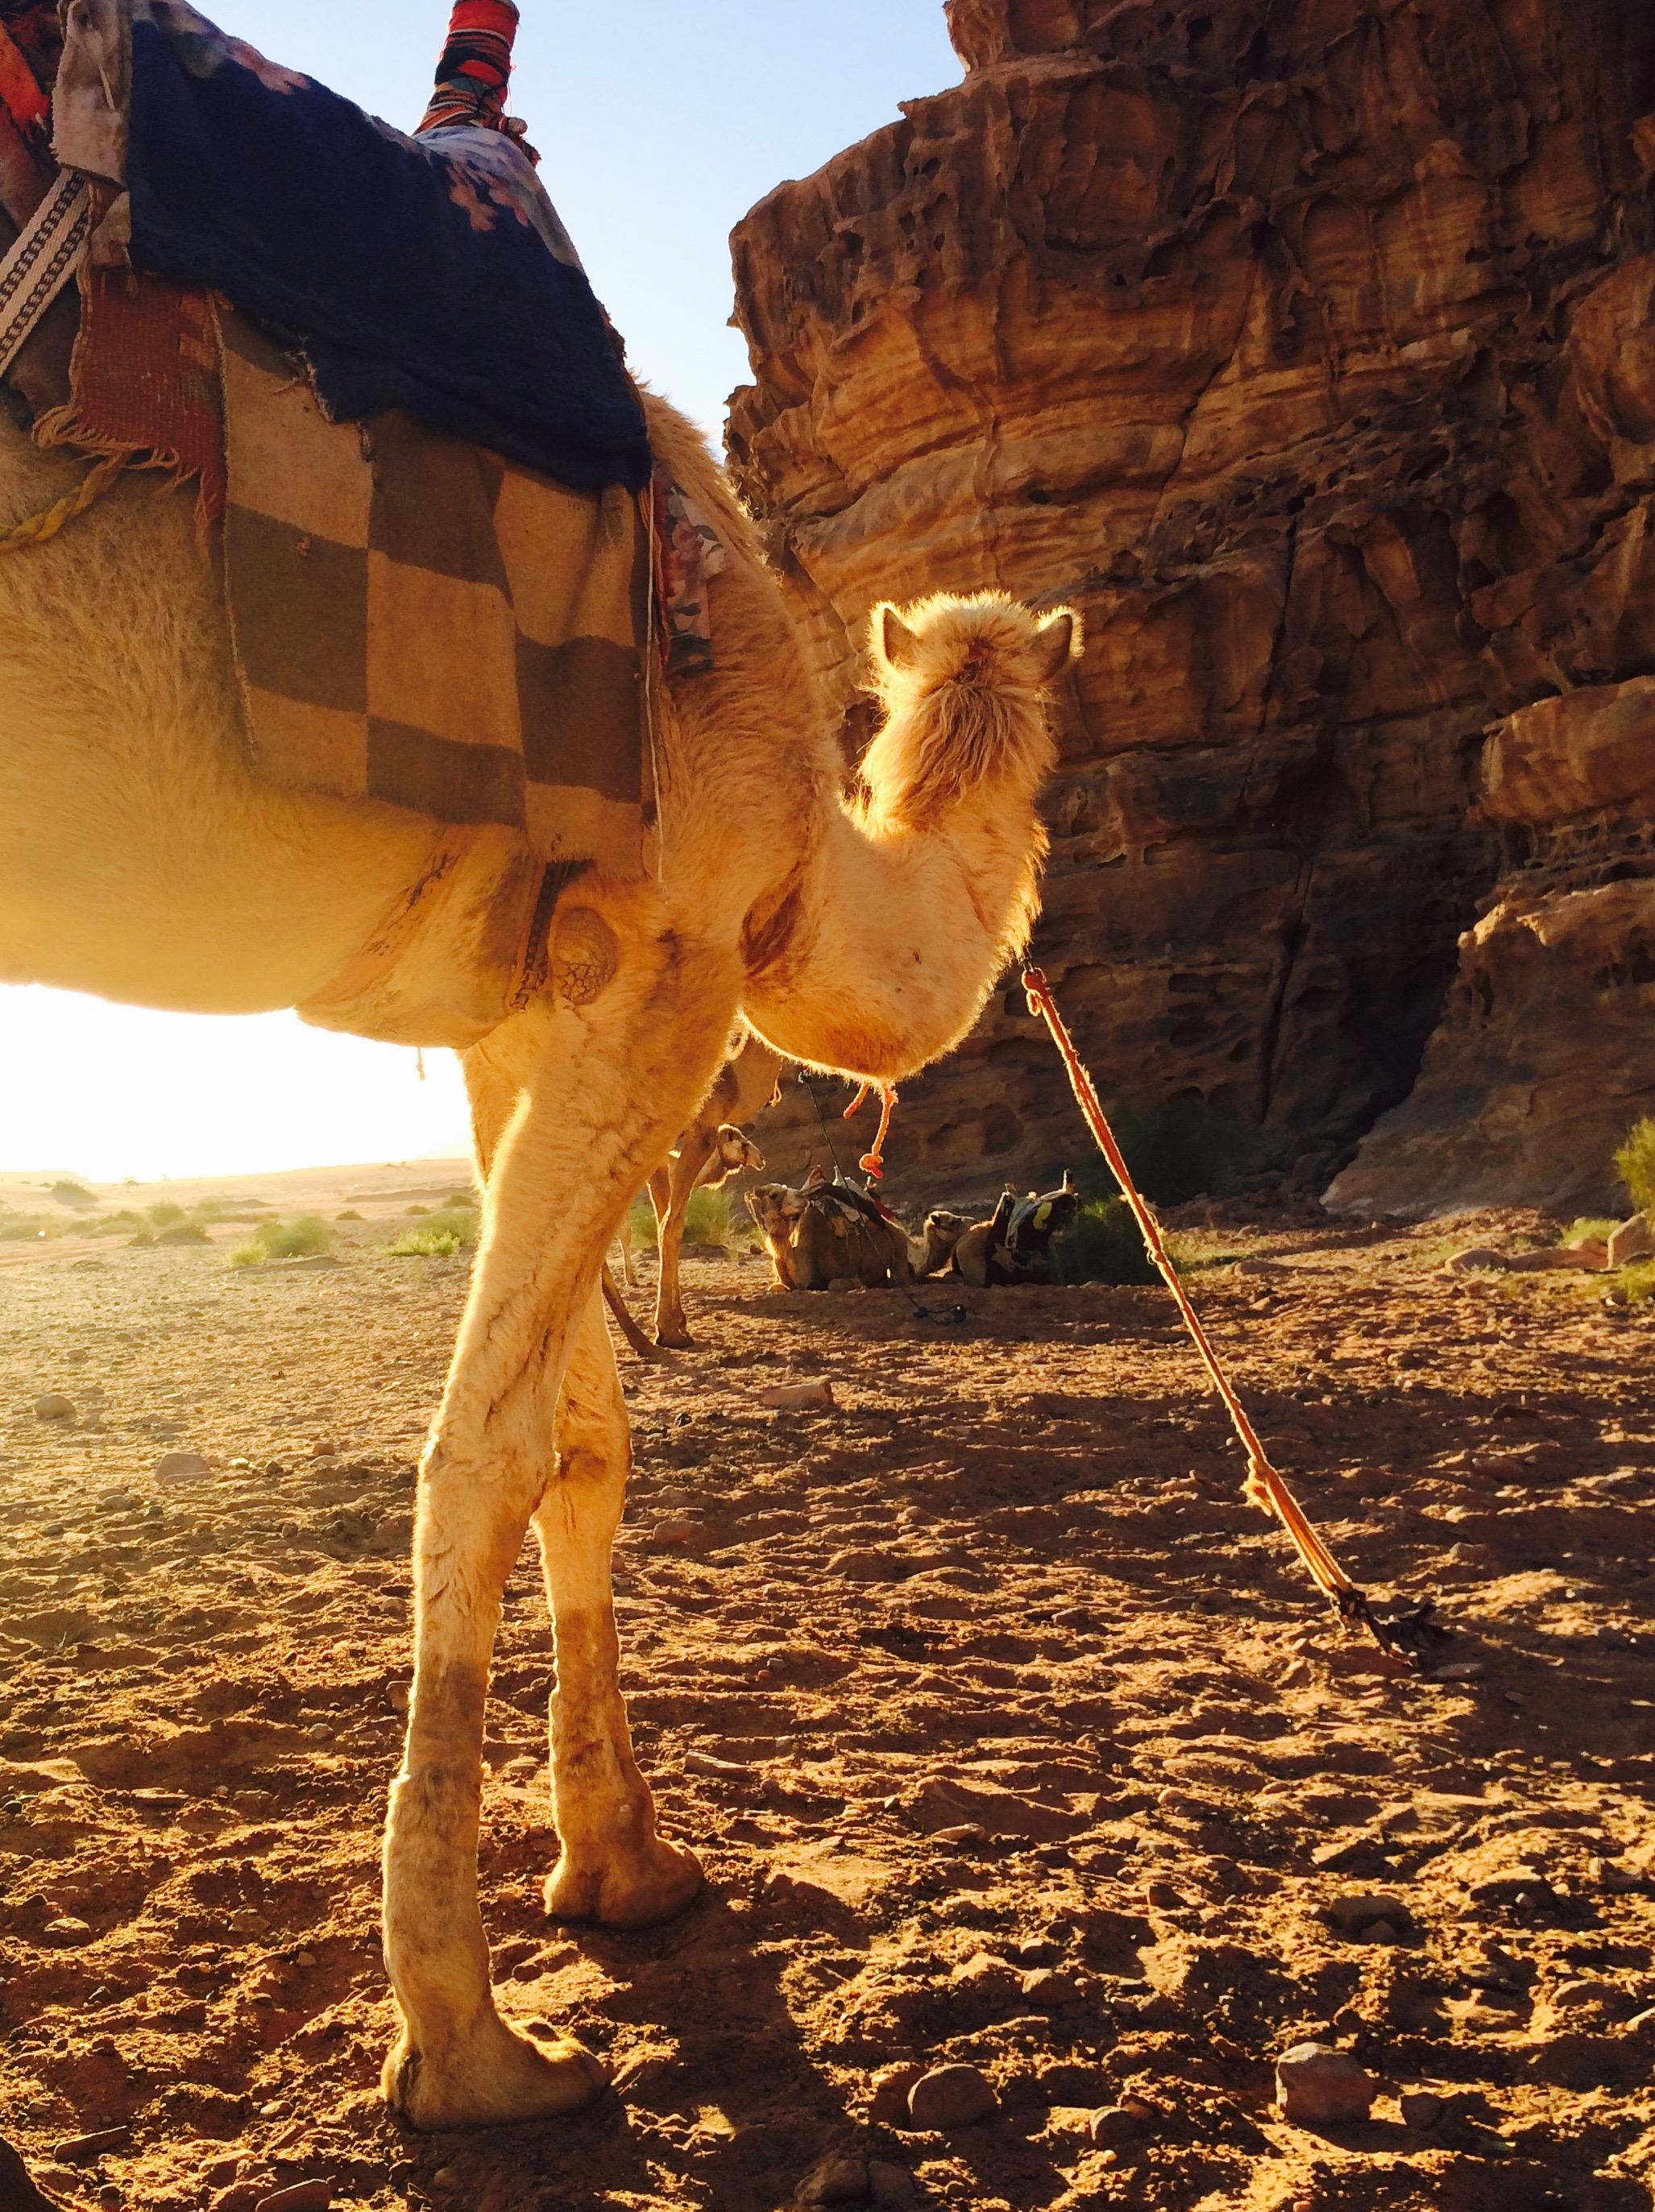 Camel ride at sunrise, Wadi Rum Jordan - 3 Days*